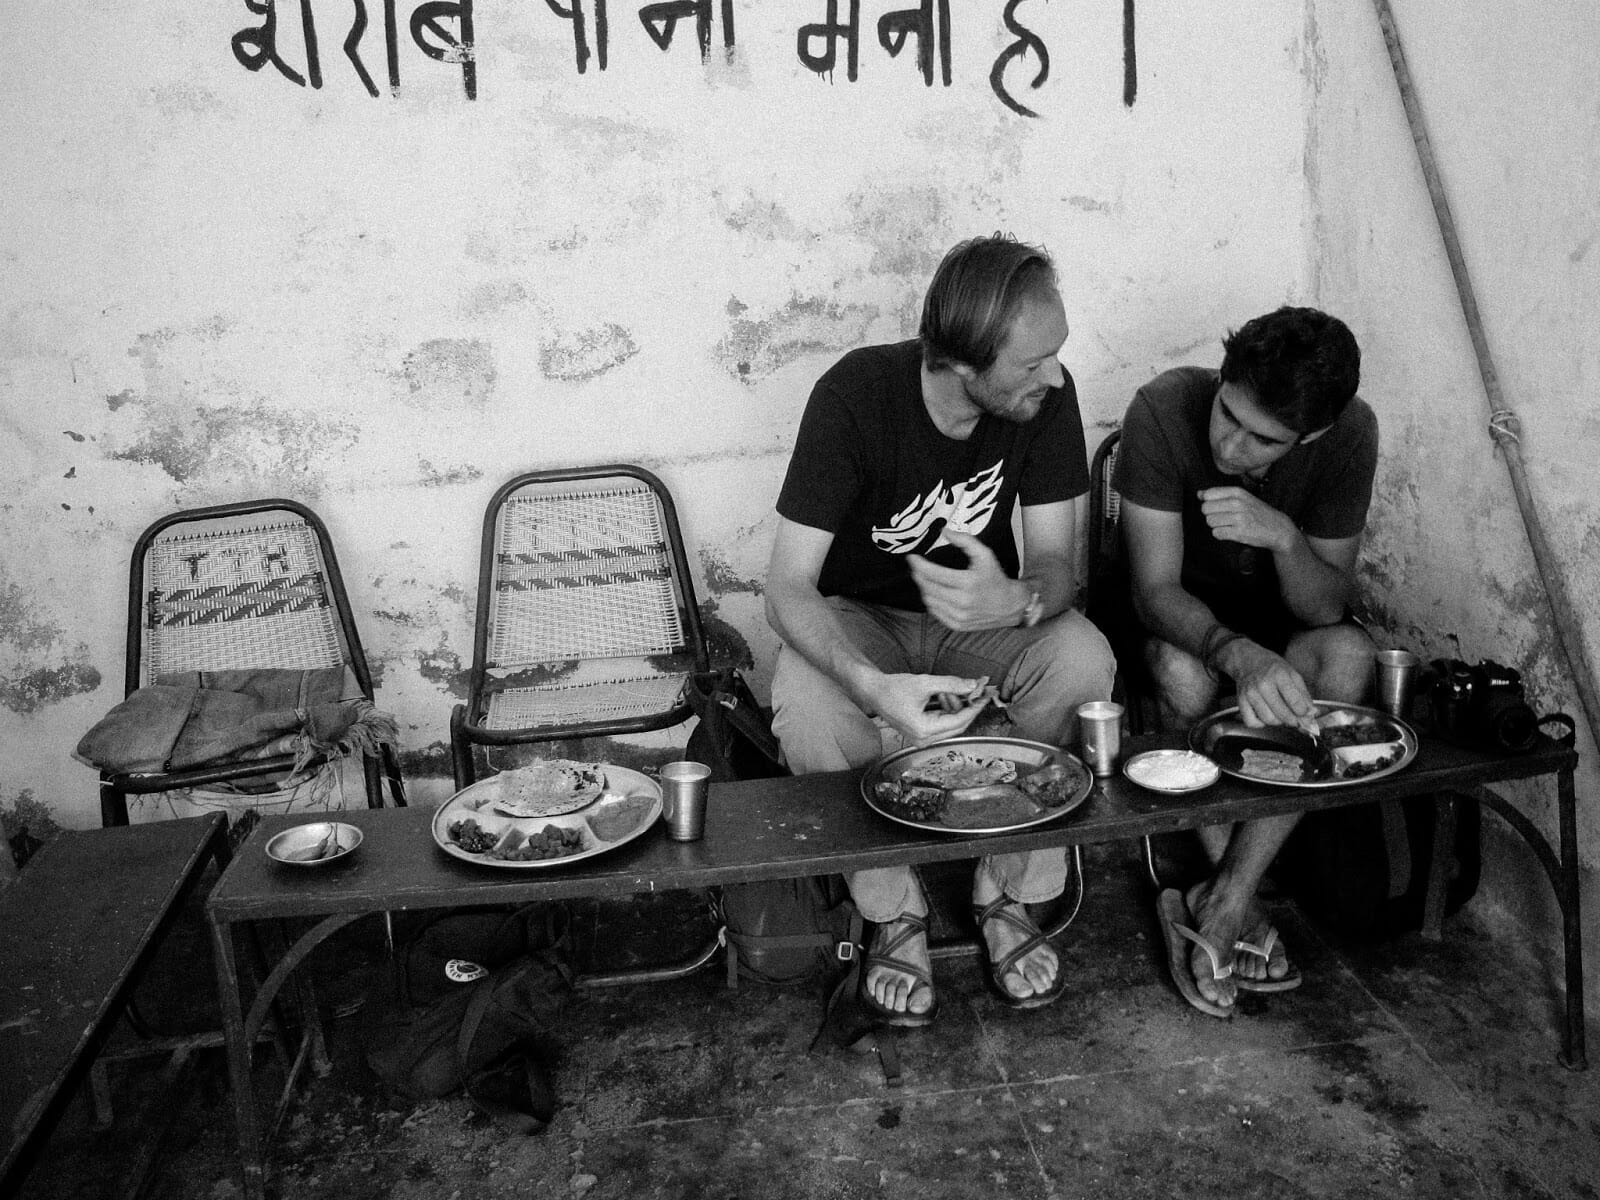 GGI recipient Drew Kerr (M.A., Divinity '16) in Rajasthan, India